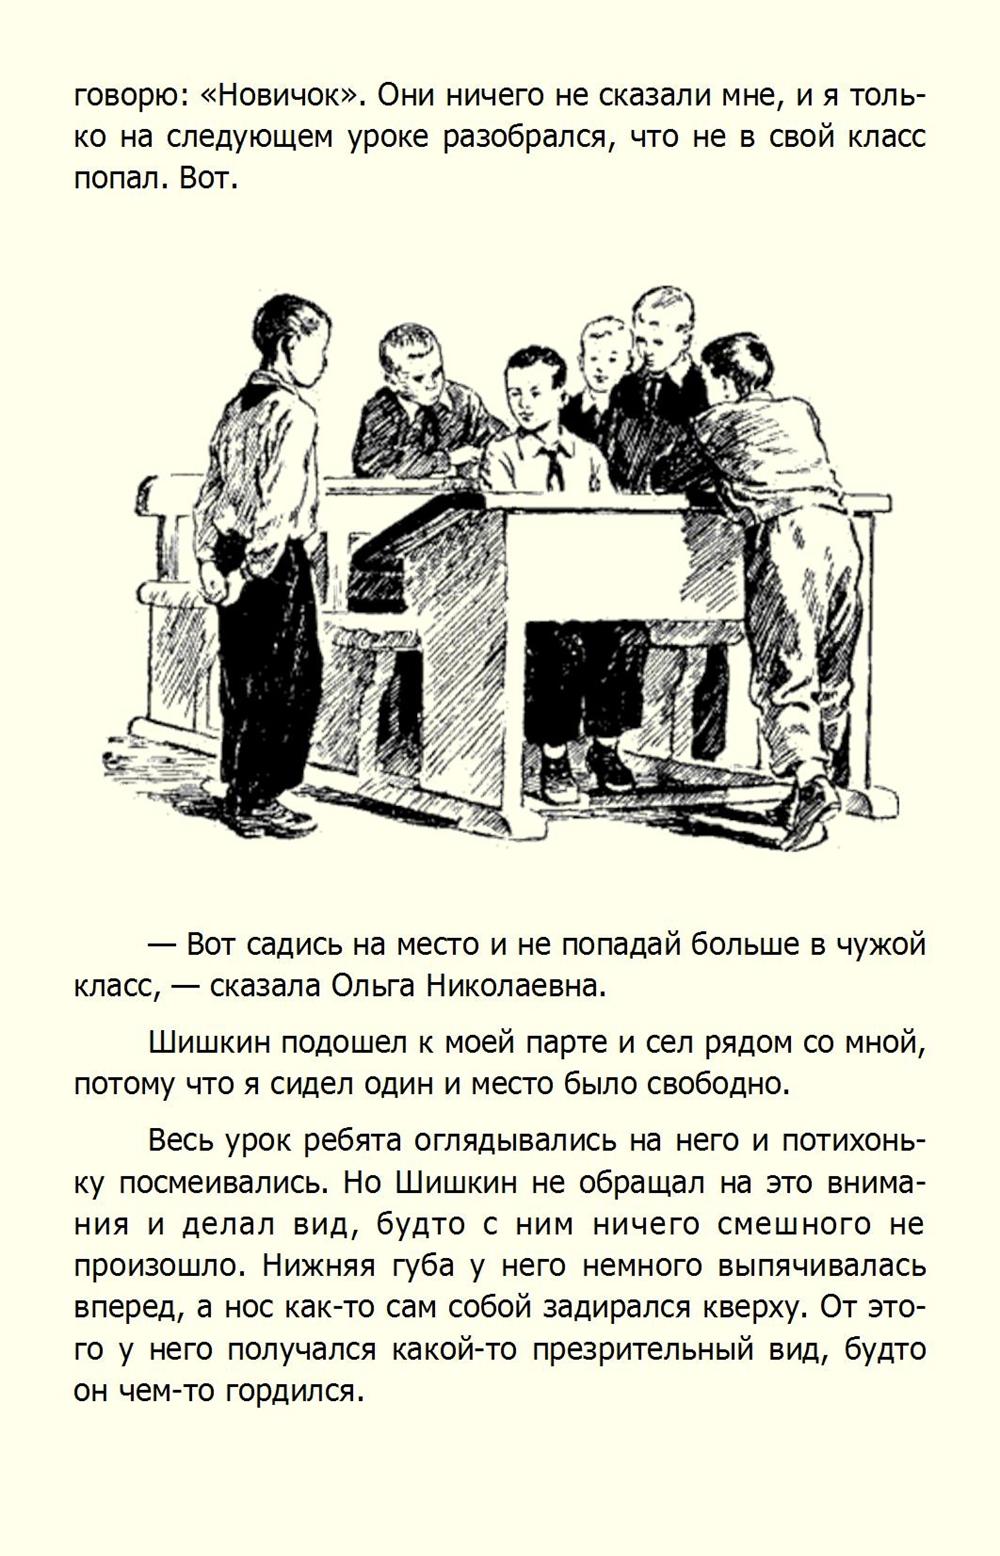 http://ipic.su/img/img7/fs/04.1598002078.jpg